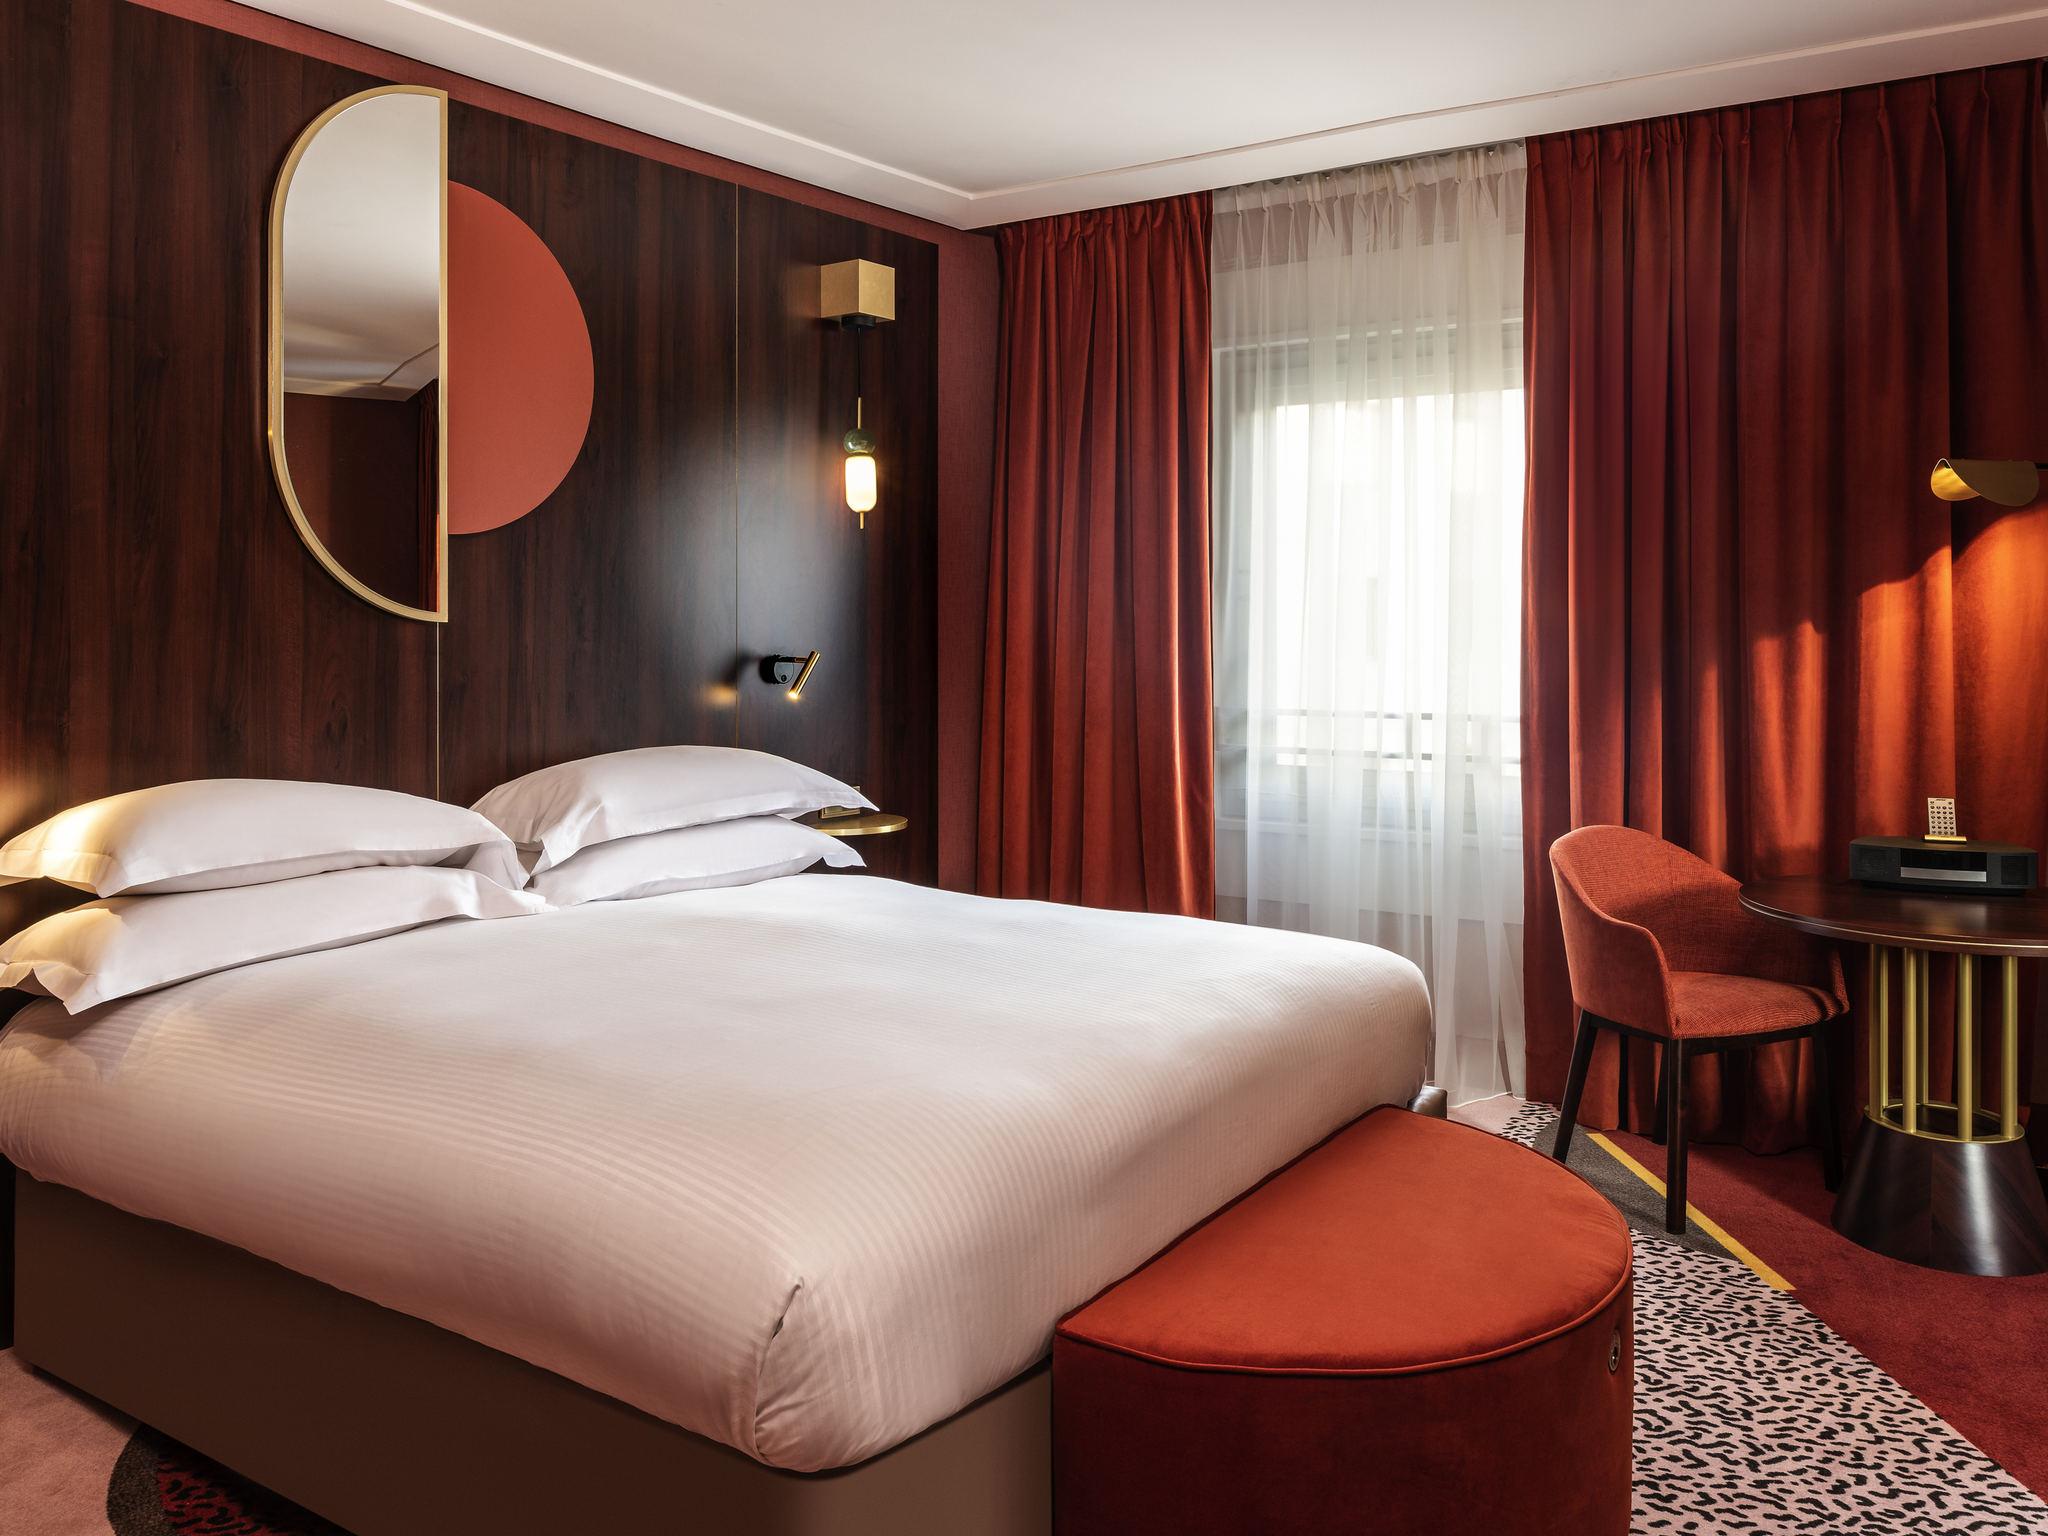 فندق - سوفيتل Sofitel باريس لاديفانس